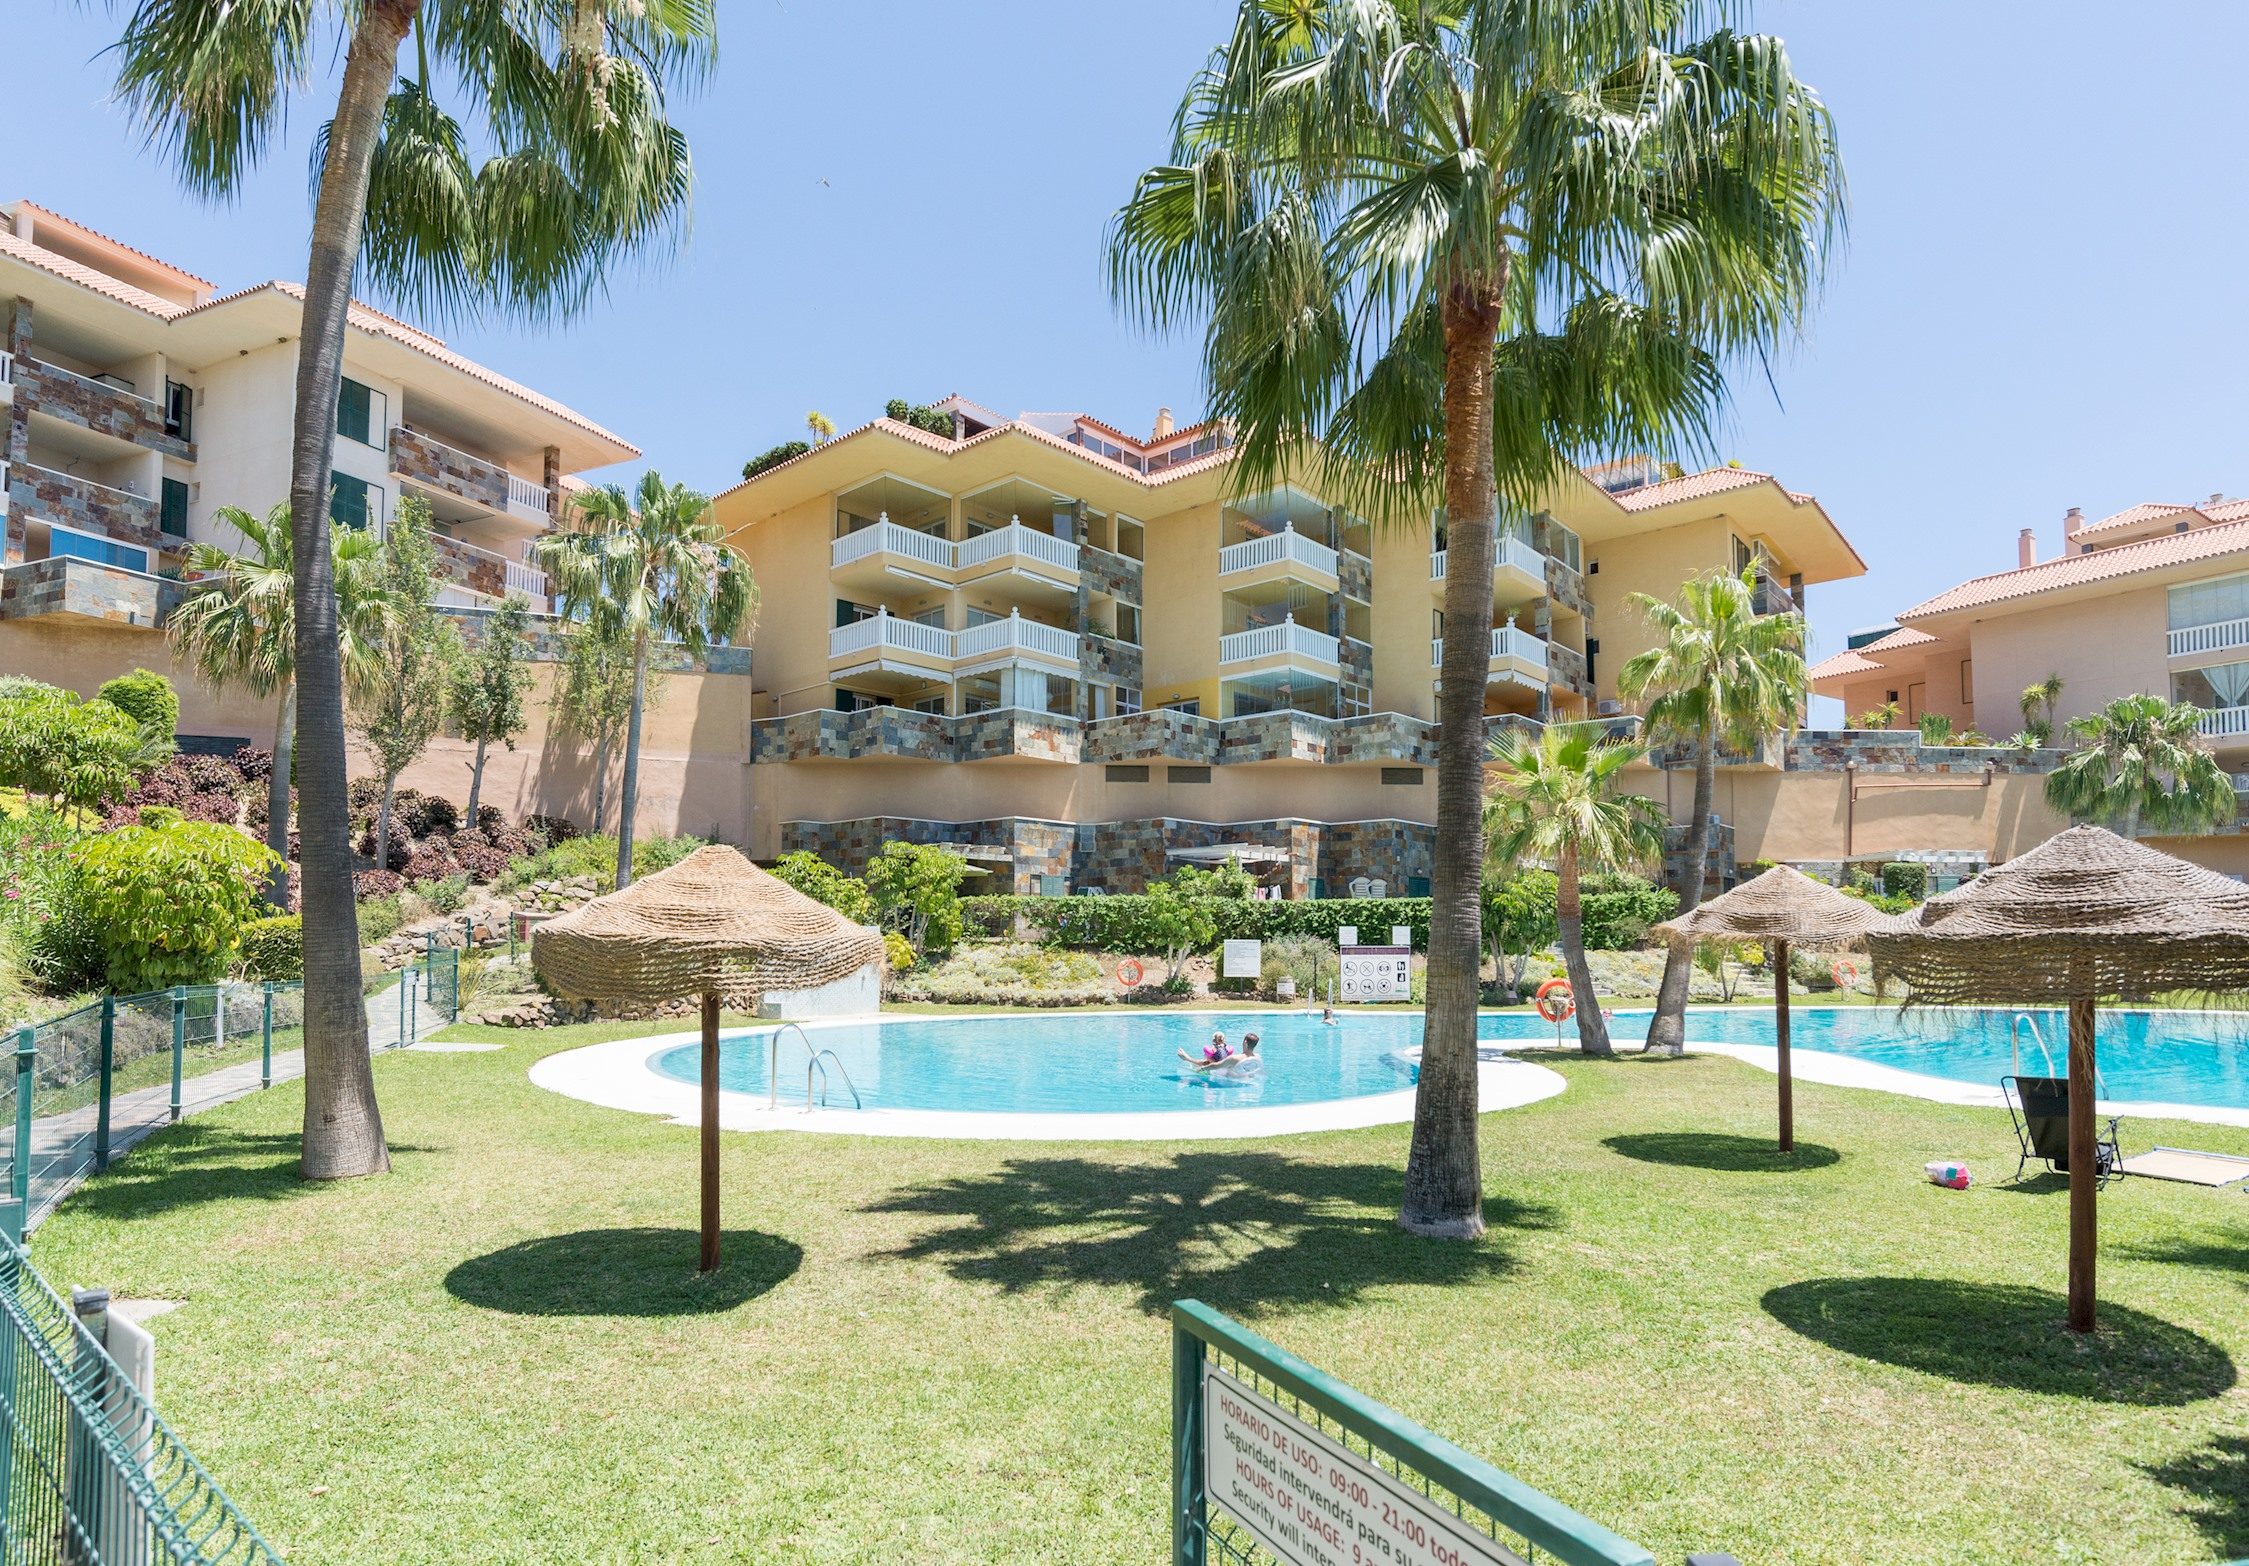 Apartment MalagaSuite Higueron Beach Pool photo 21808454